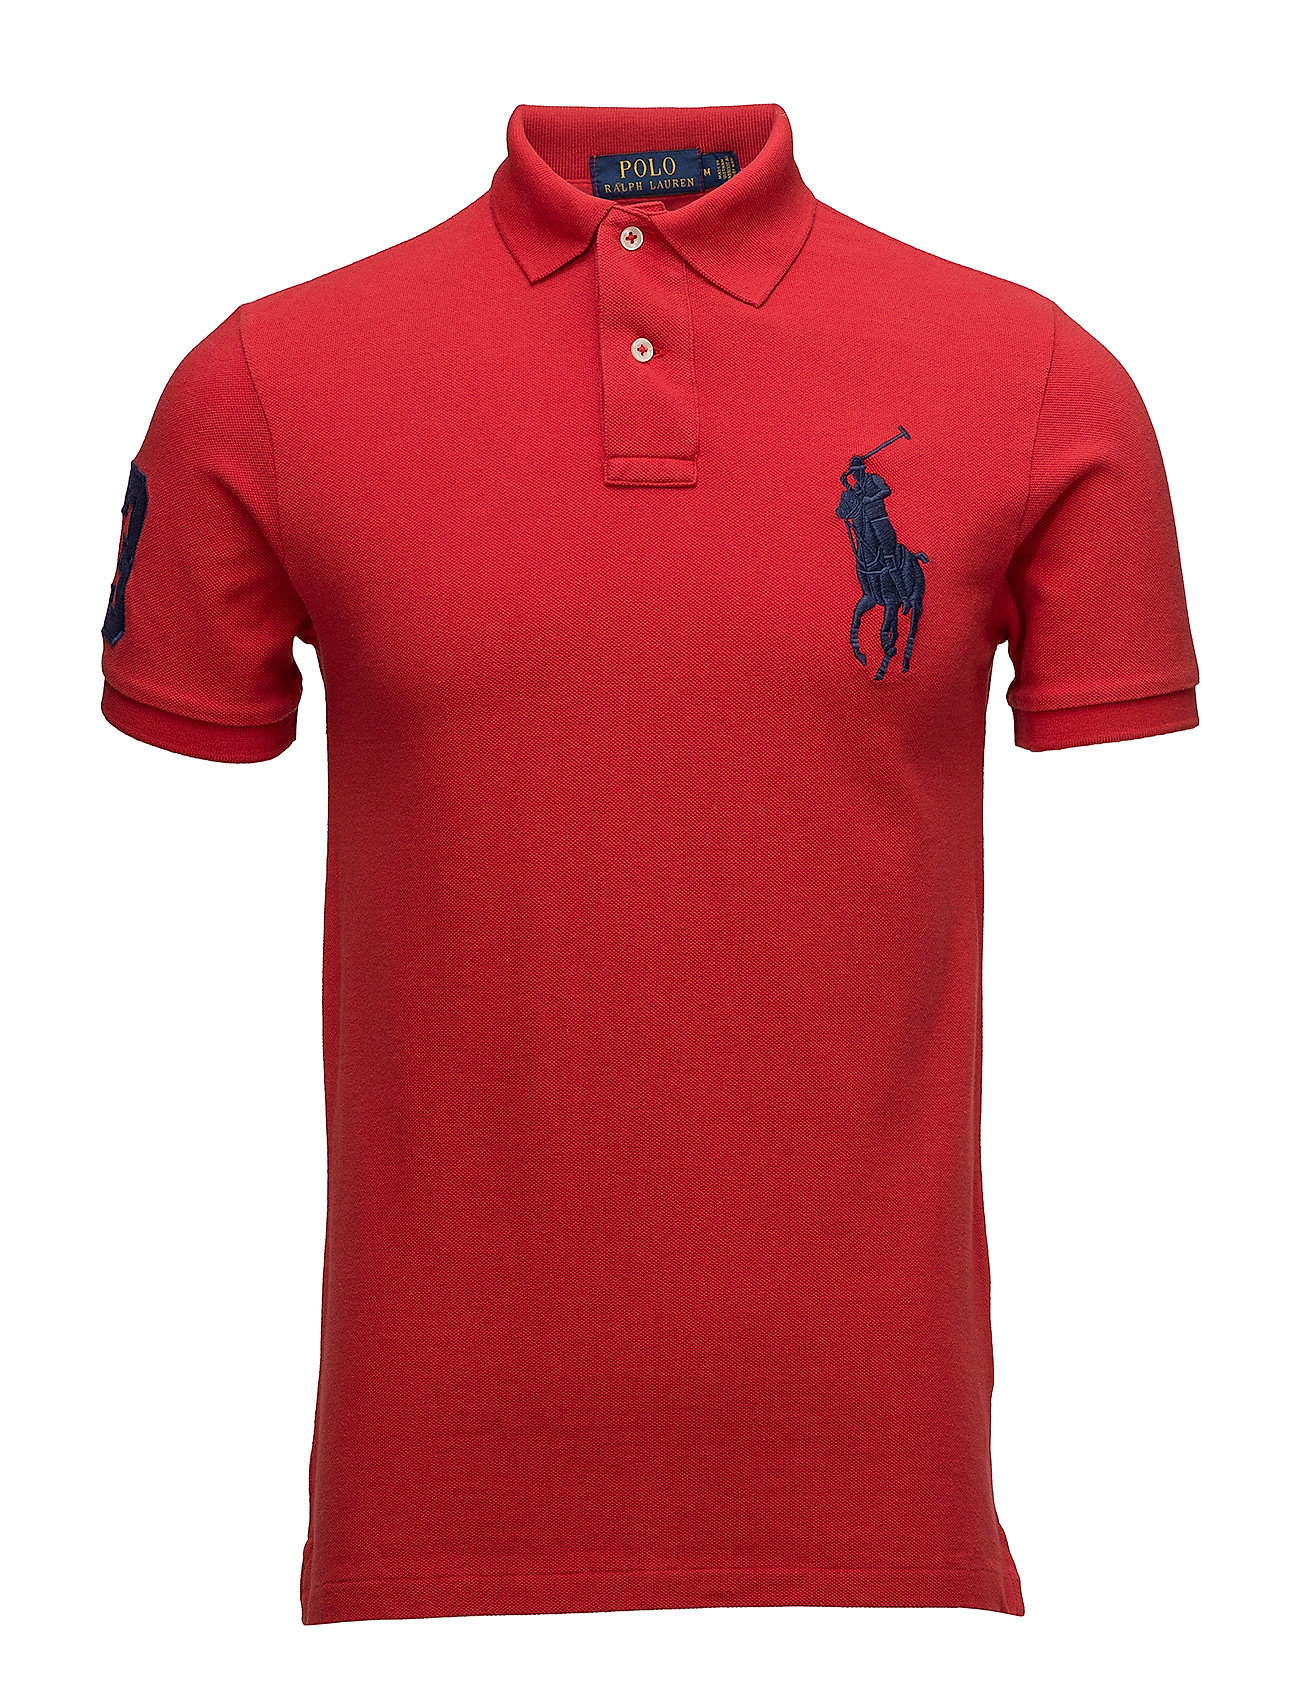 Polo Ralph Lauren Slim-Fit Mesh Polo Shirt - RL 2000 RED